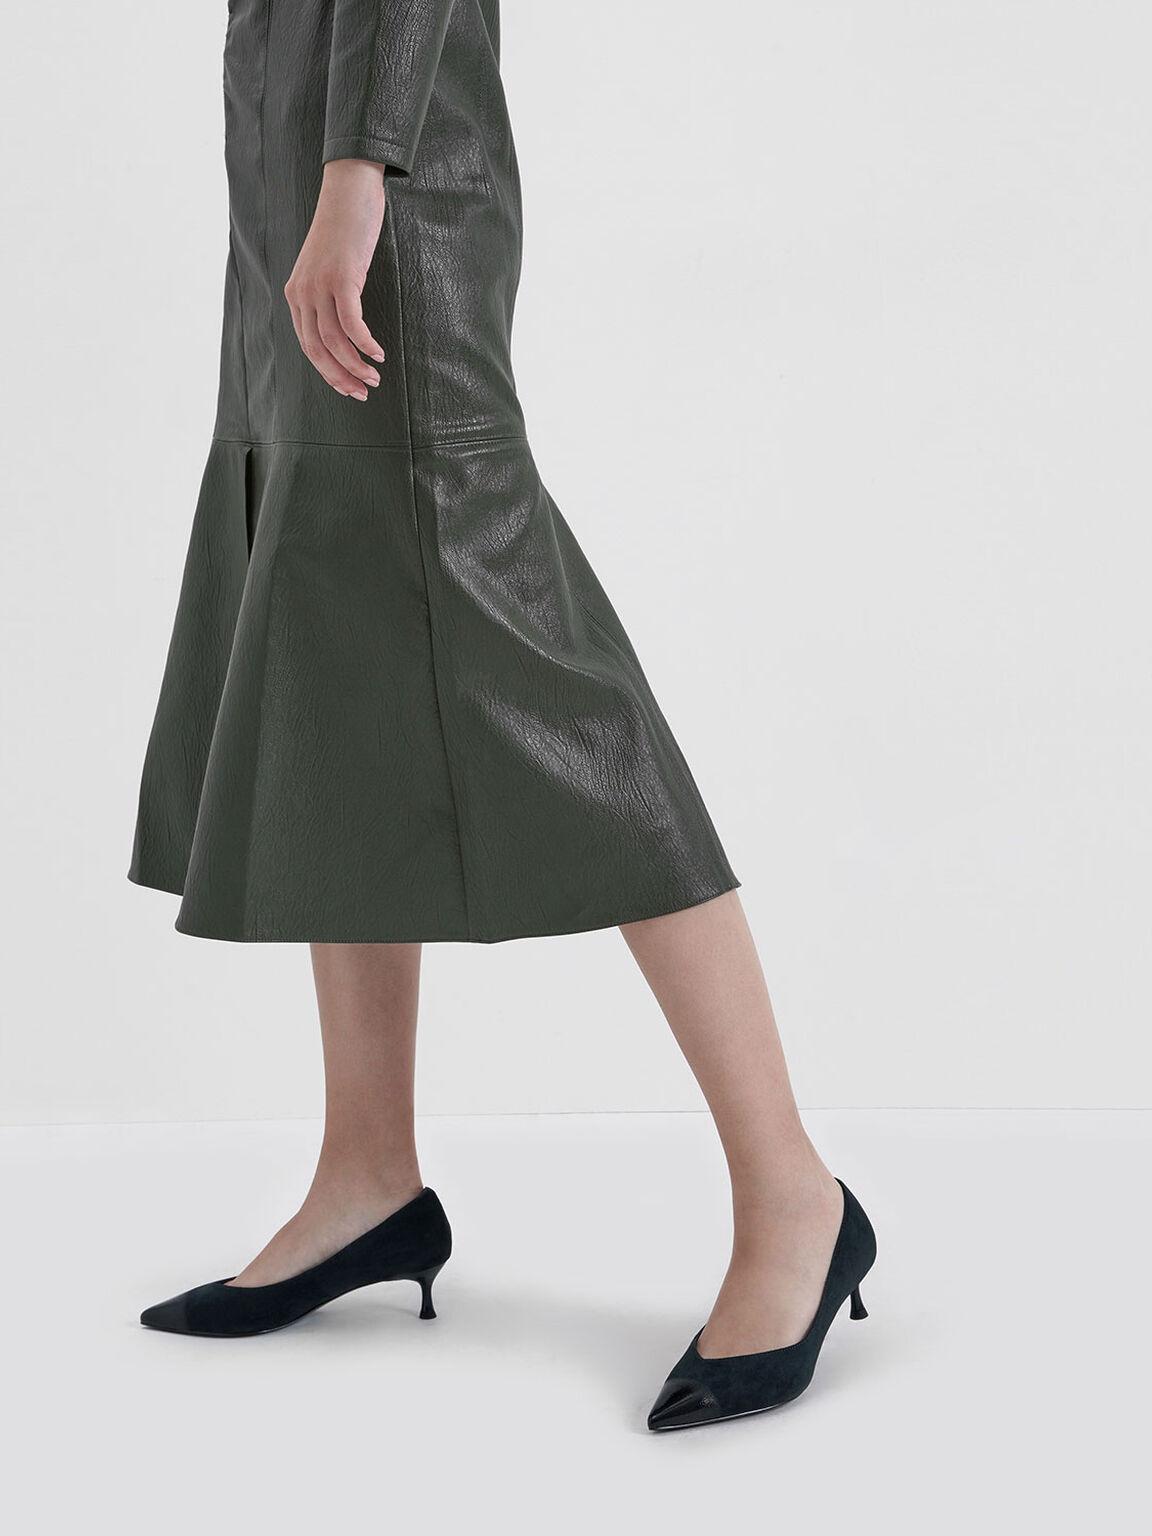 Brushed Effect Textured Sculptural Heel Pumps, Dark Green, hi-res